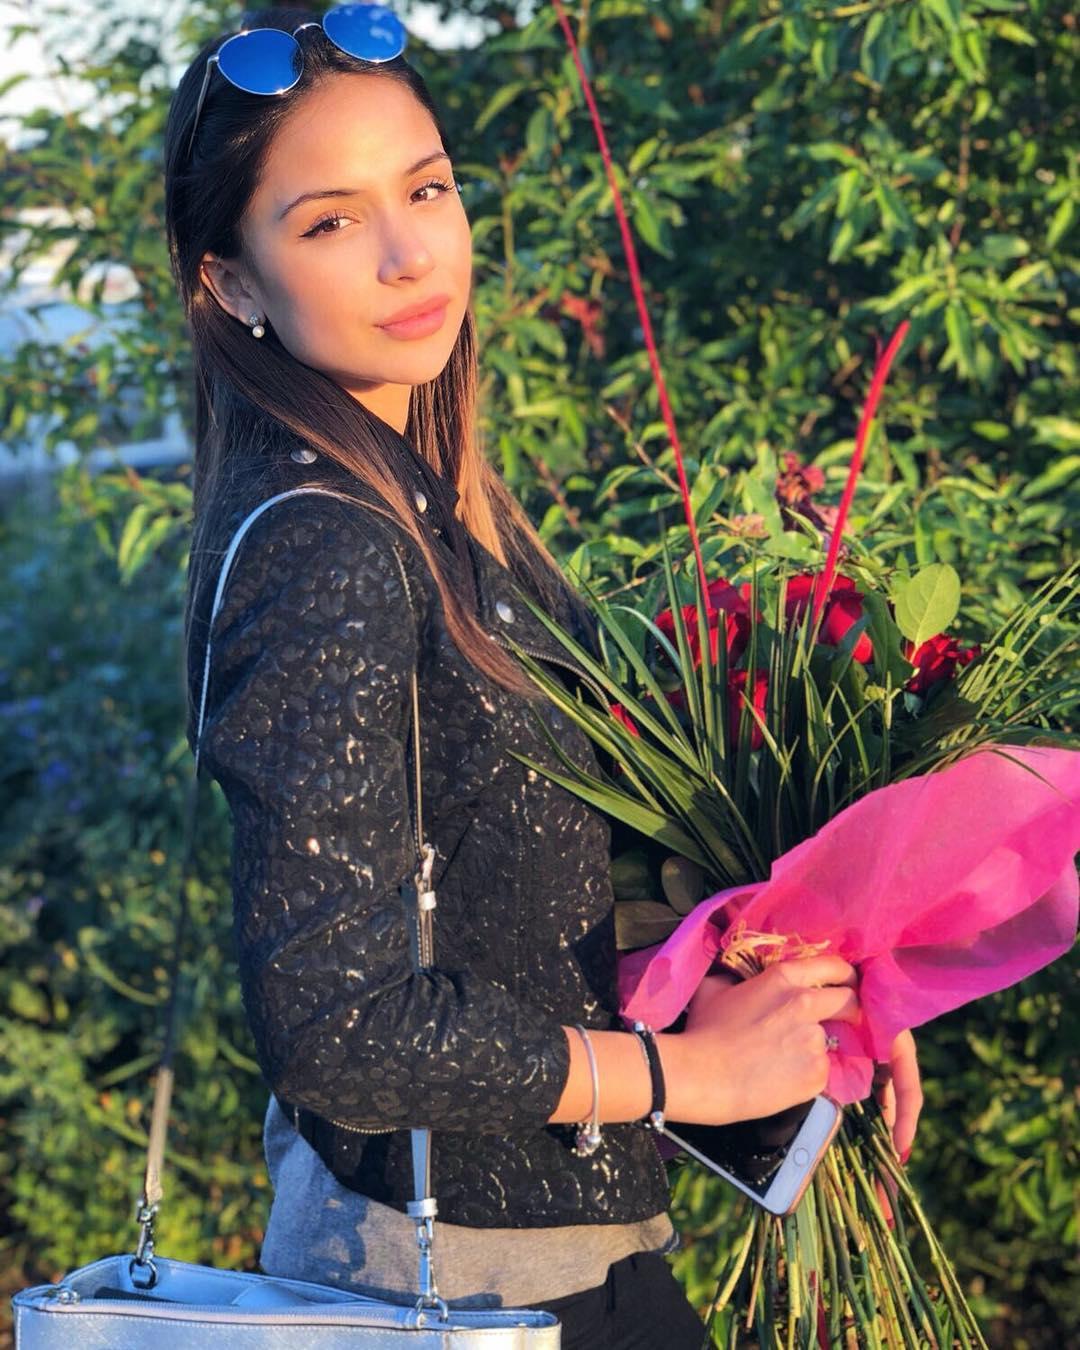 Genissa-Gonzalez-Wallpapers-Insta-Fit-Bio-5